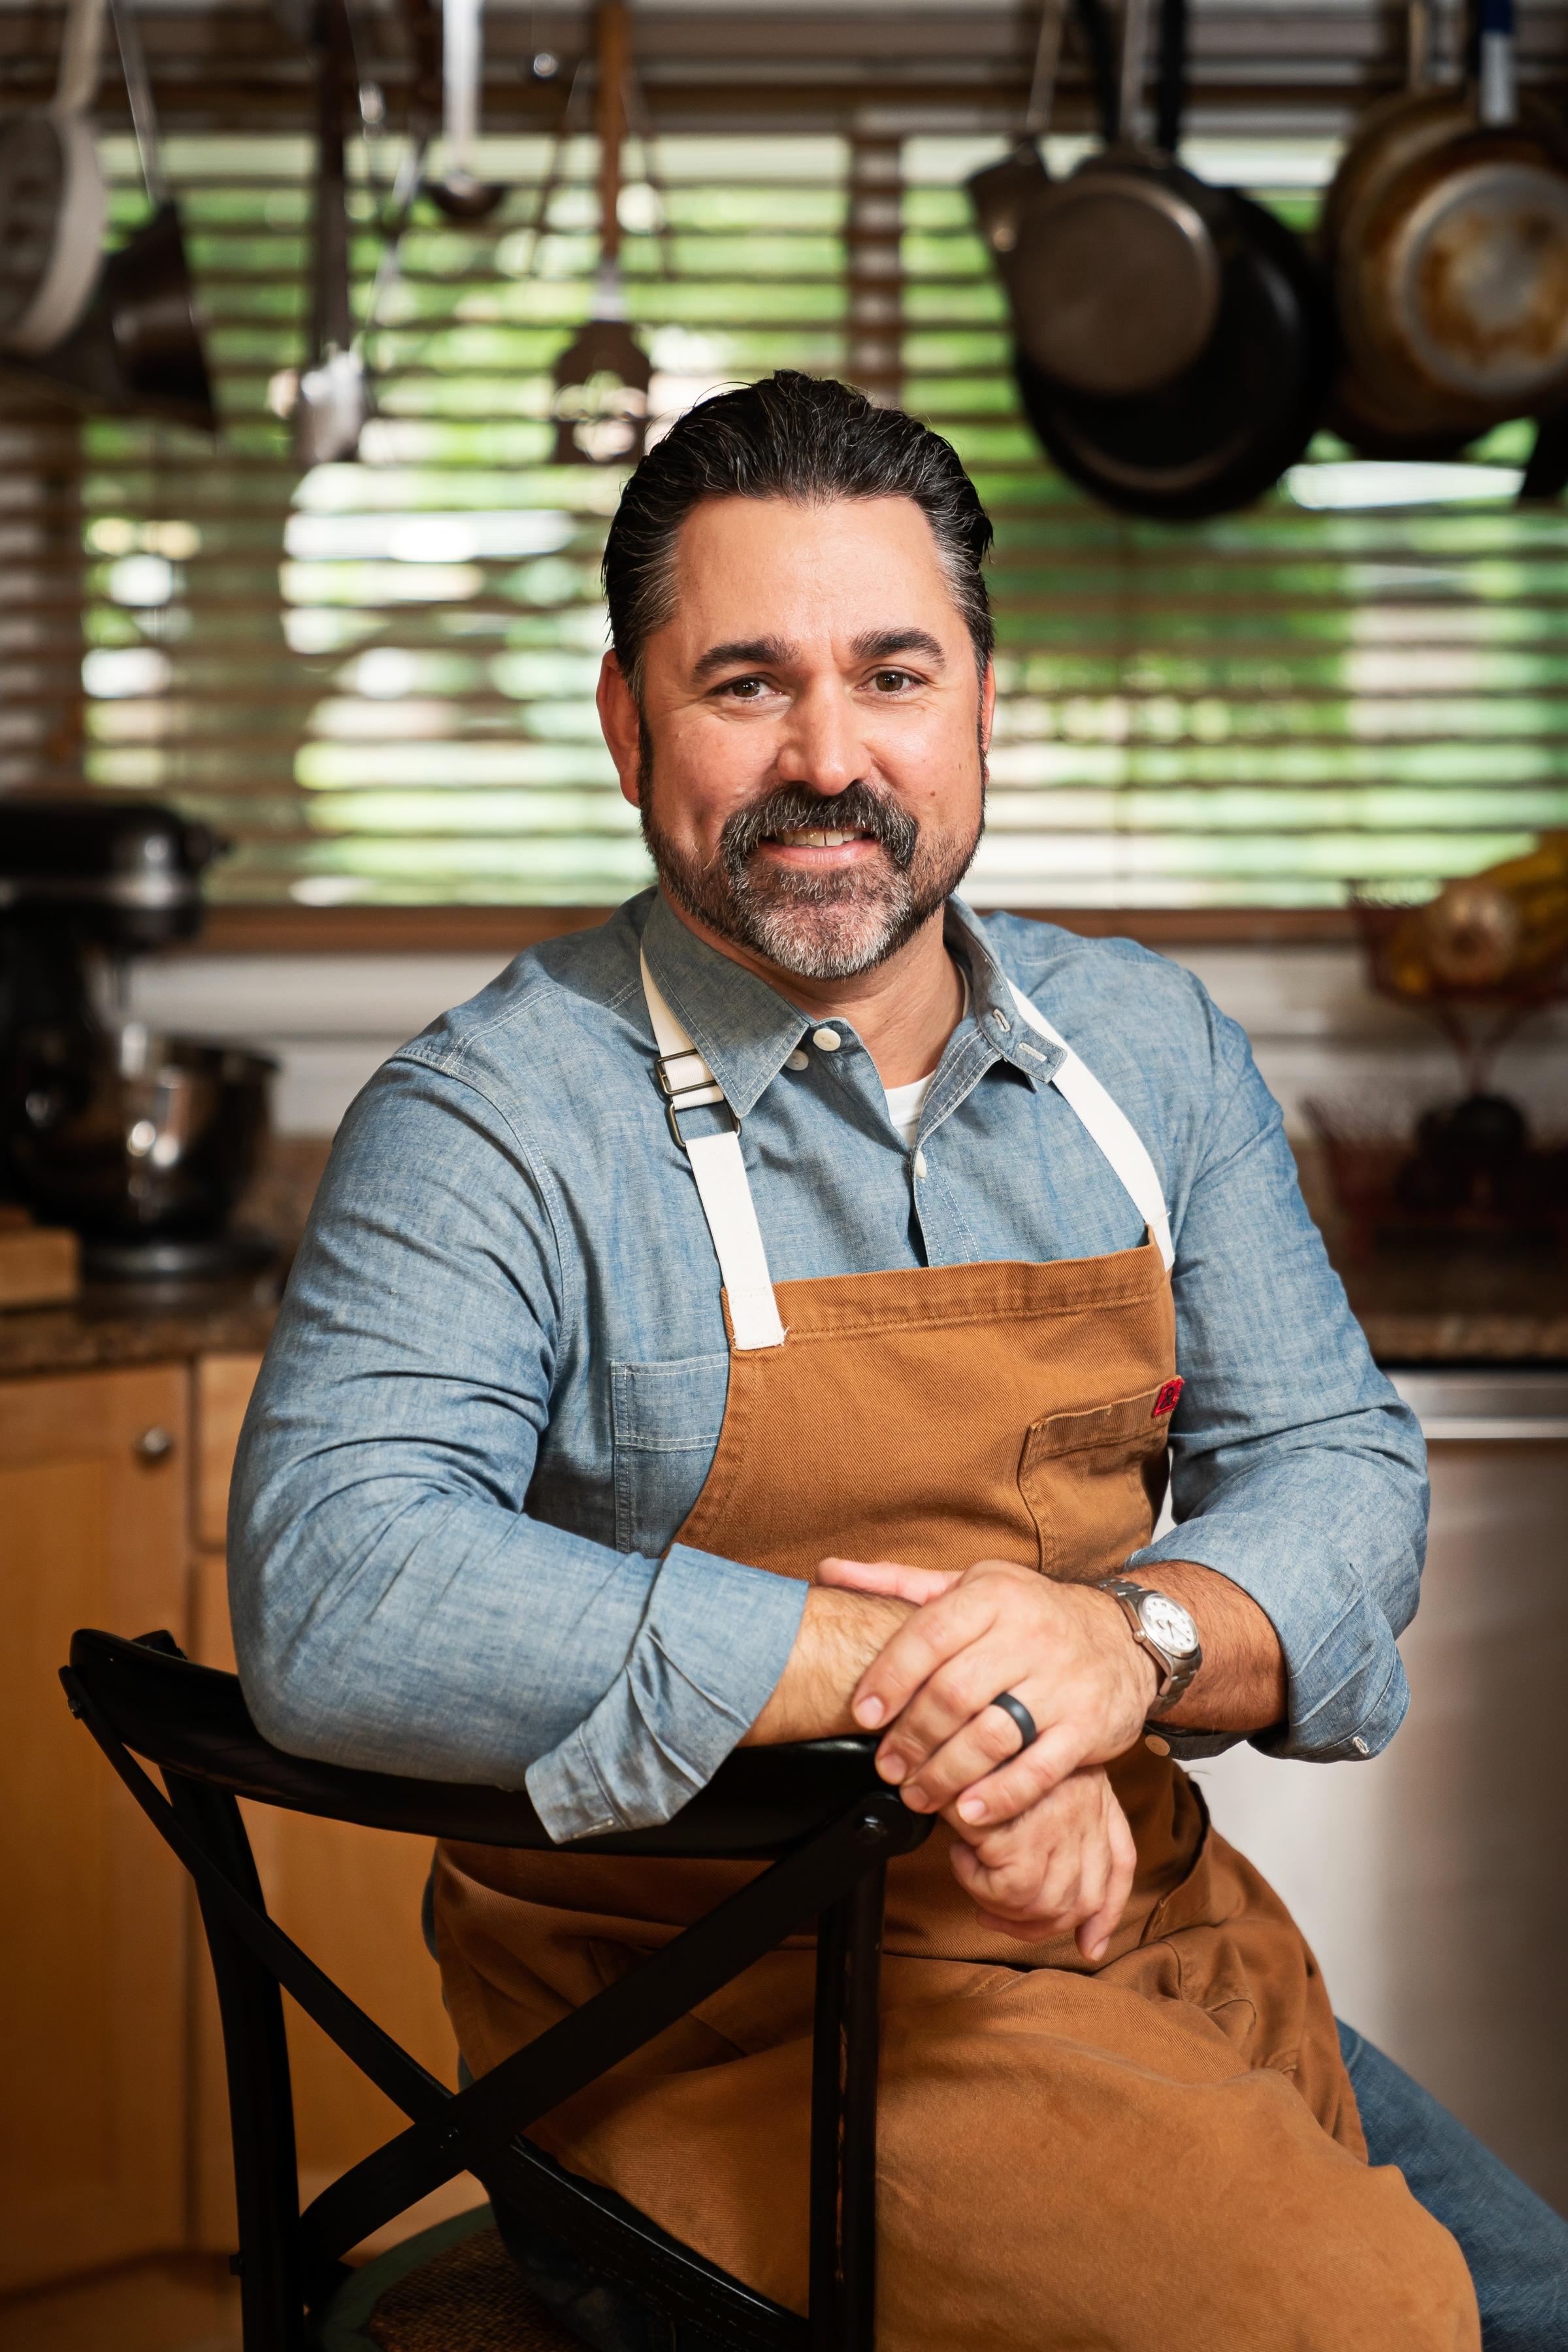 Chef David Guas